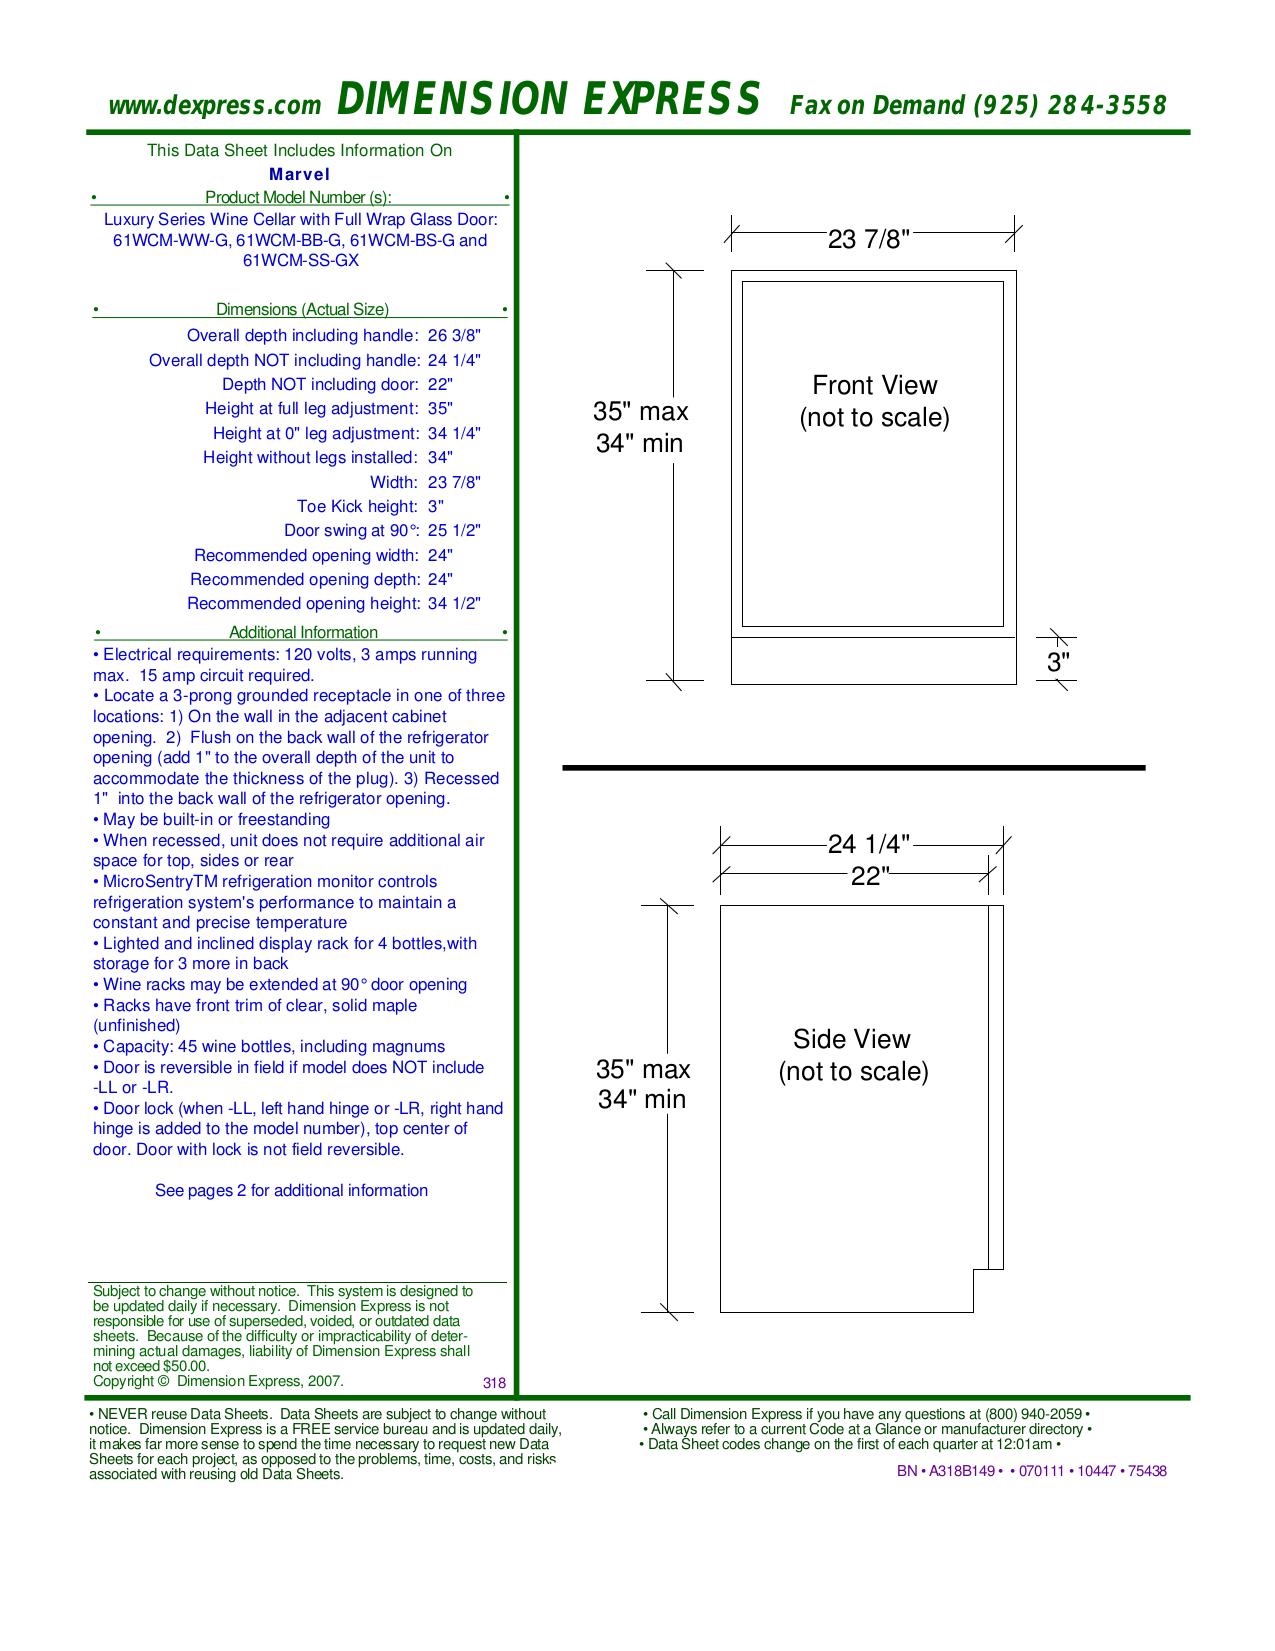 pdf for Marvel Refrigerator 61WCM-BB-G manual